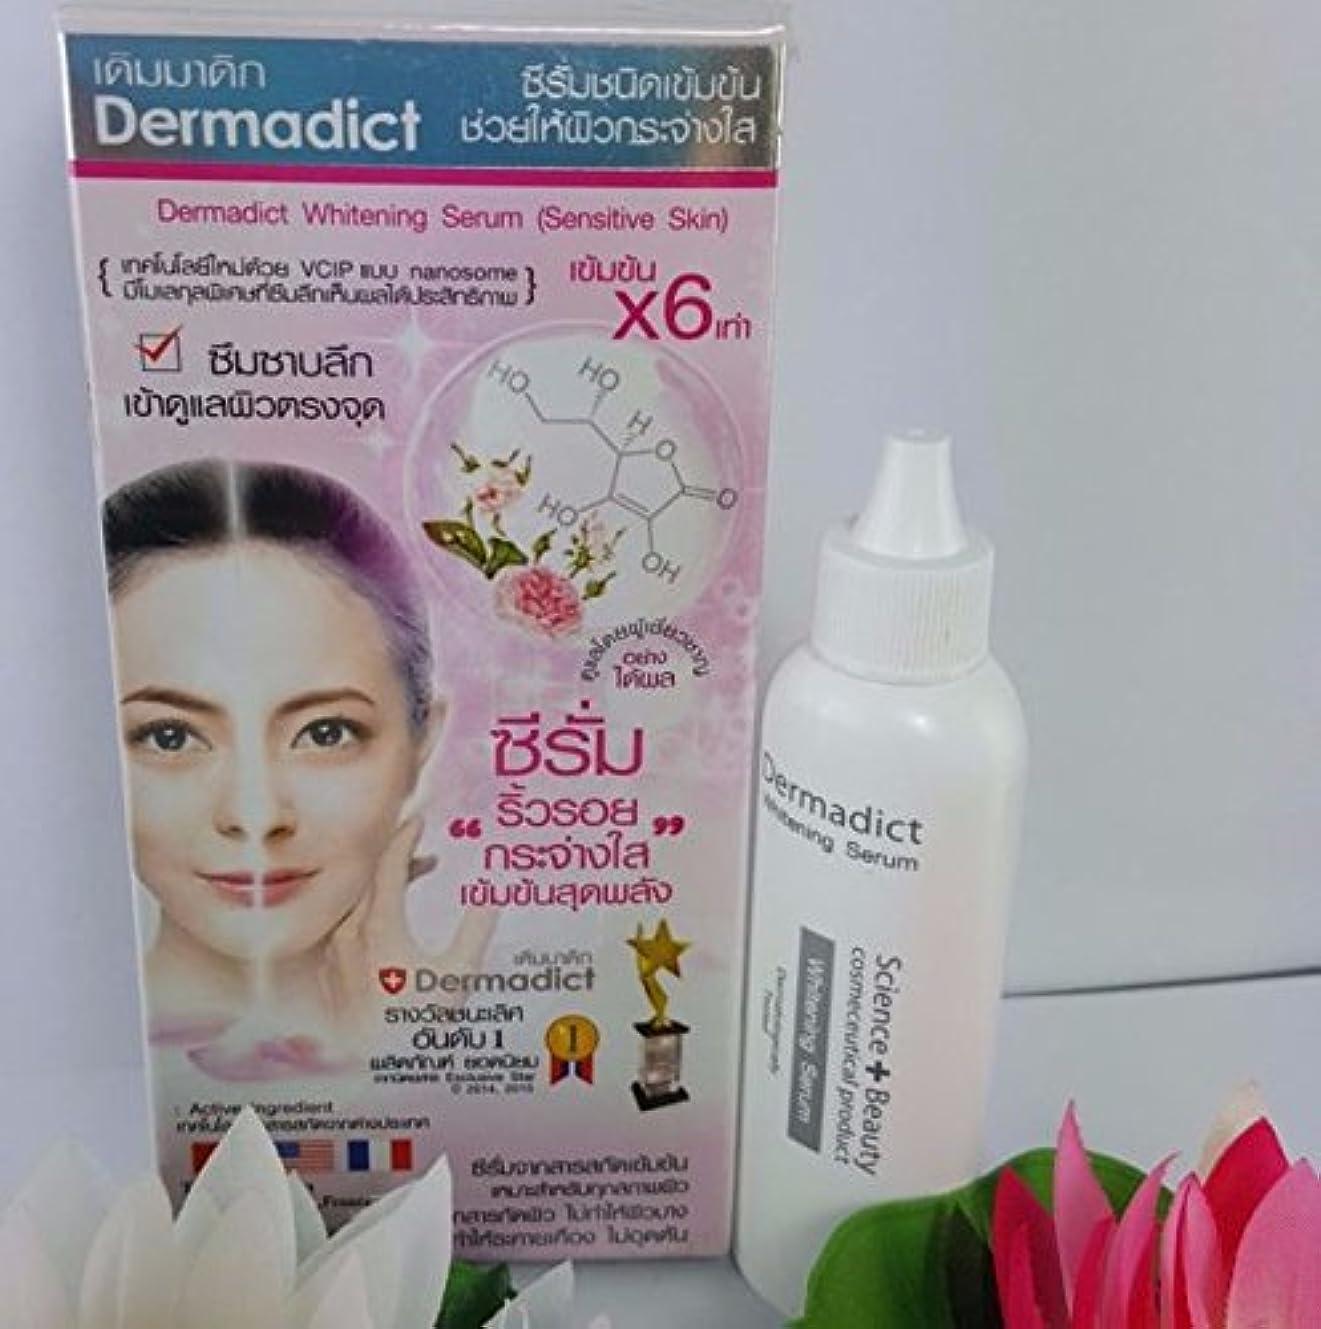 DERMADICT Whitening Serum Skin Cream Repair Sensitive Skin 15ml